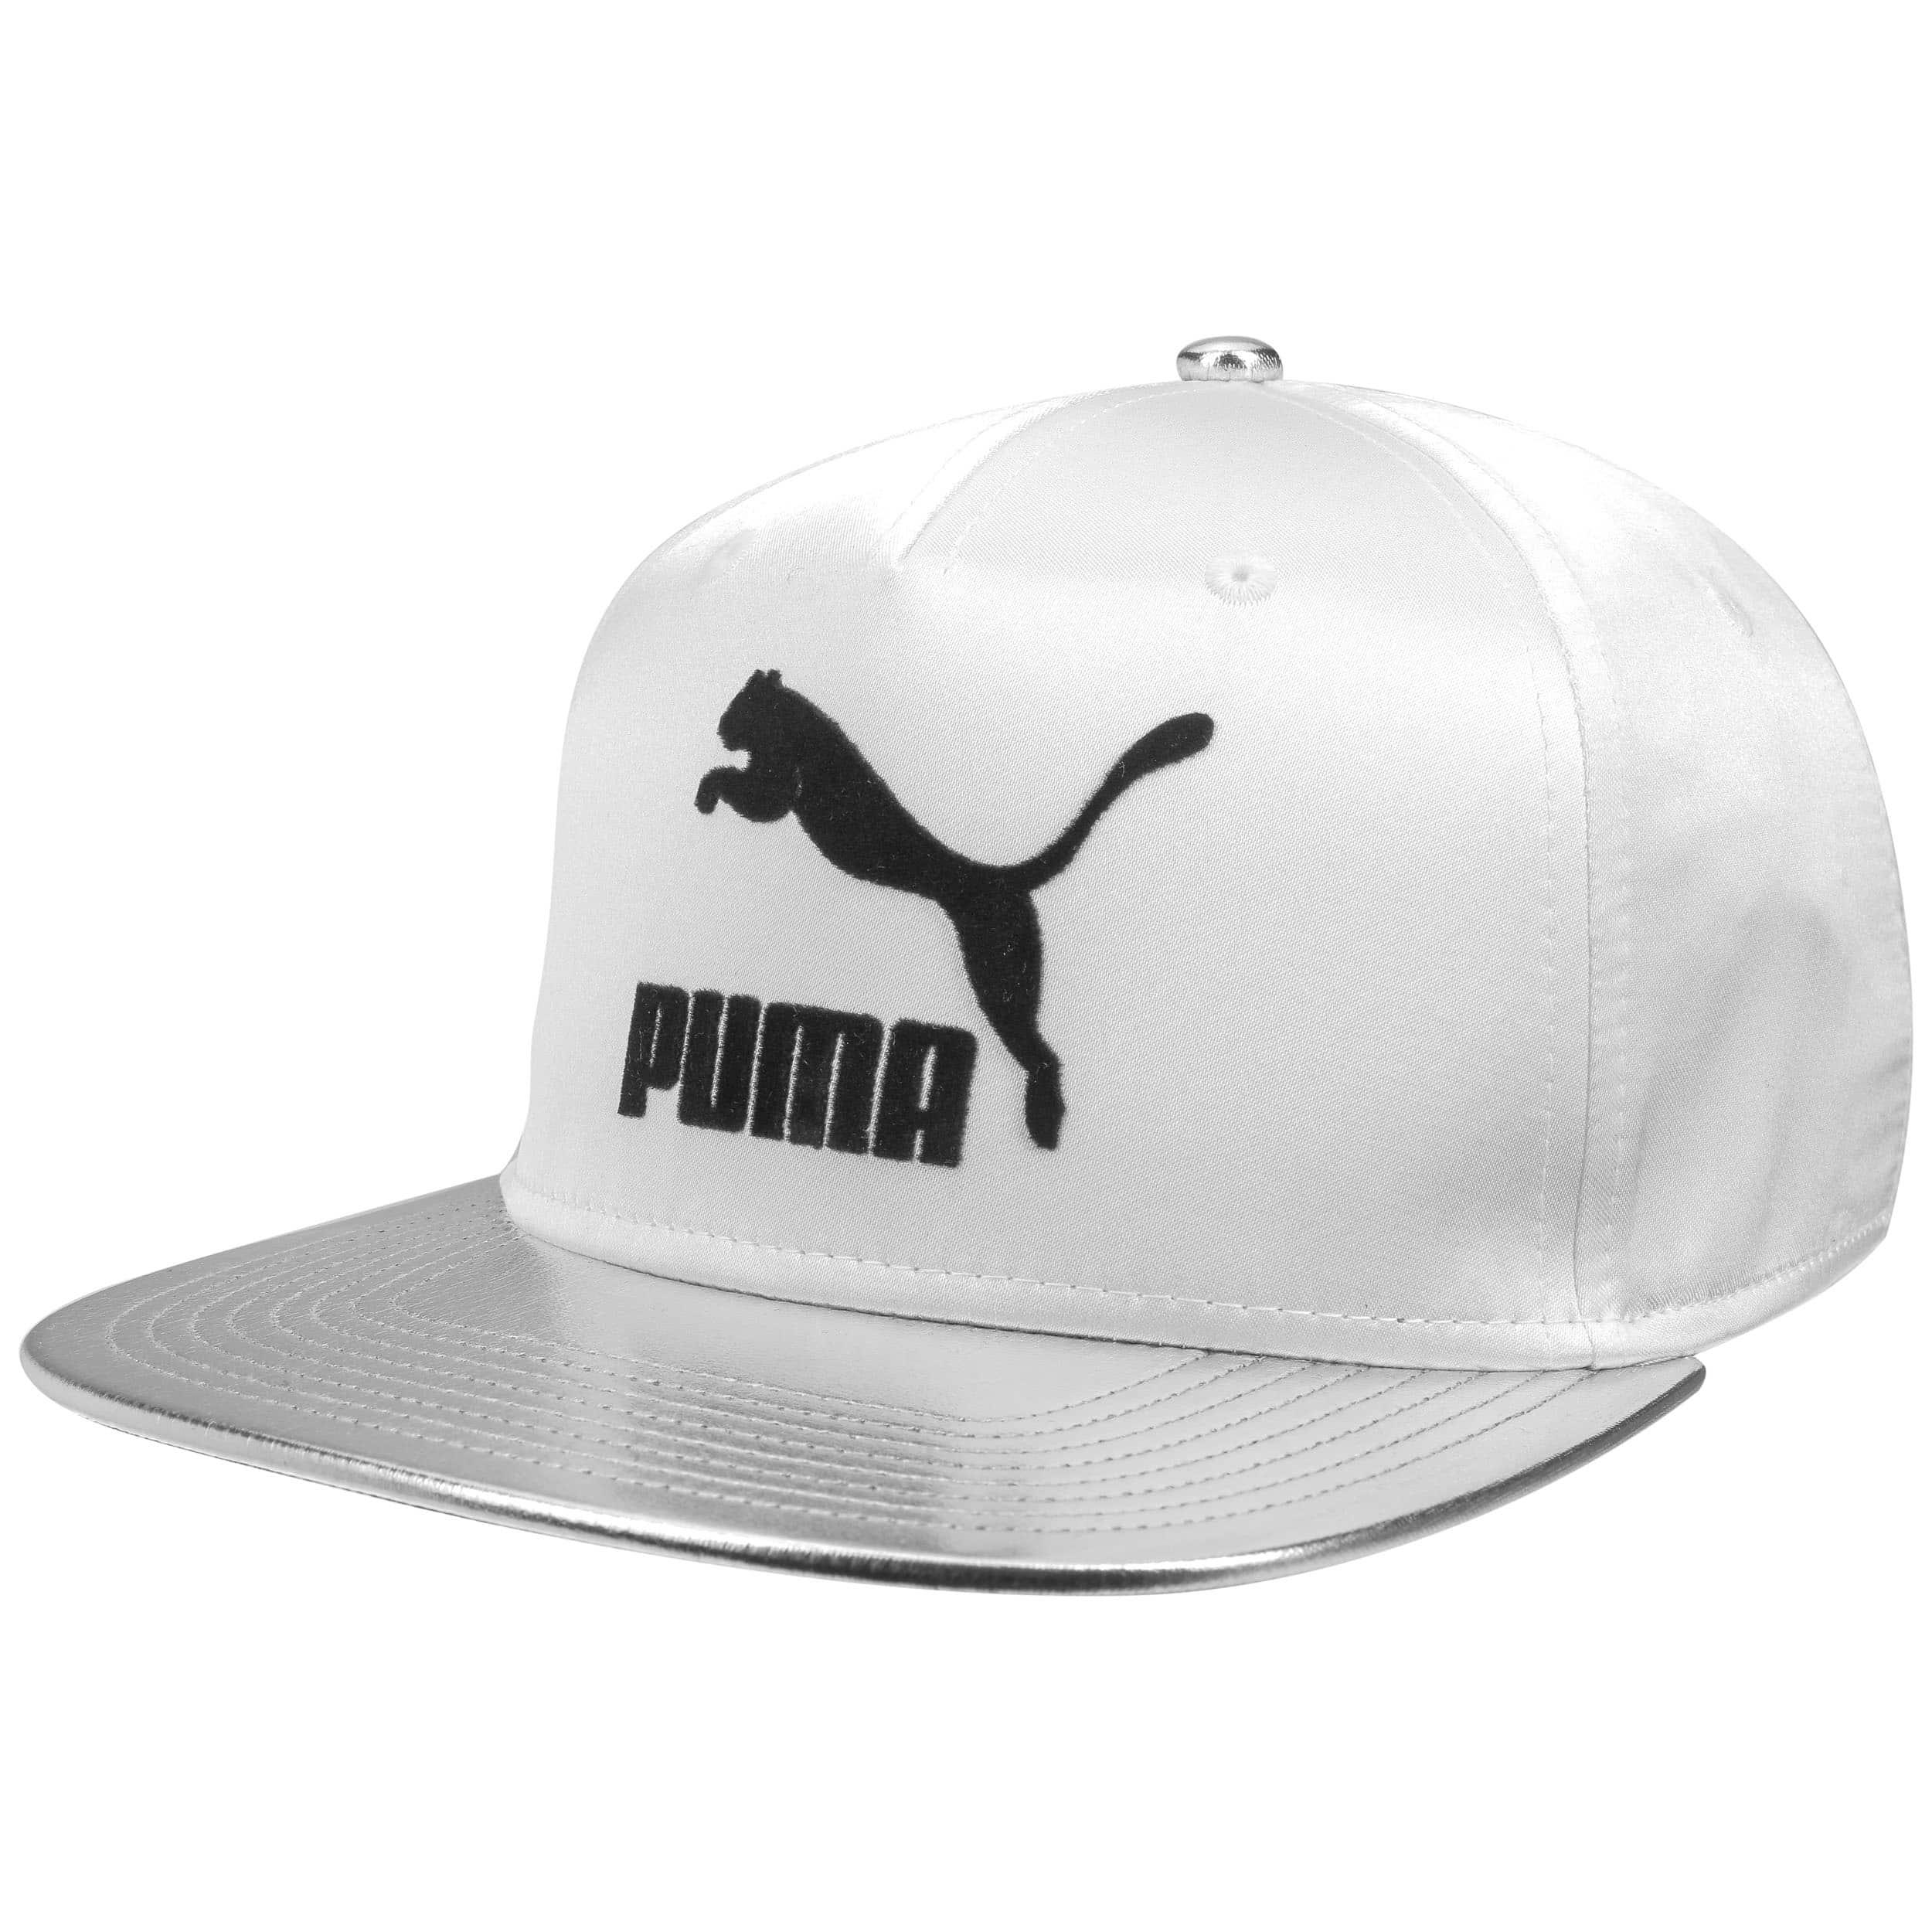 95373631bb4 ... Ringside PP Snapback Cap by PUMA - white 5